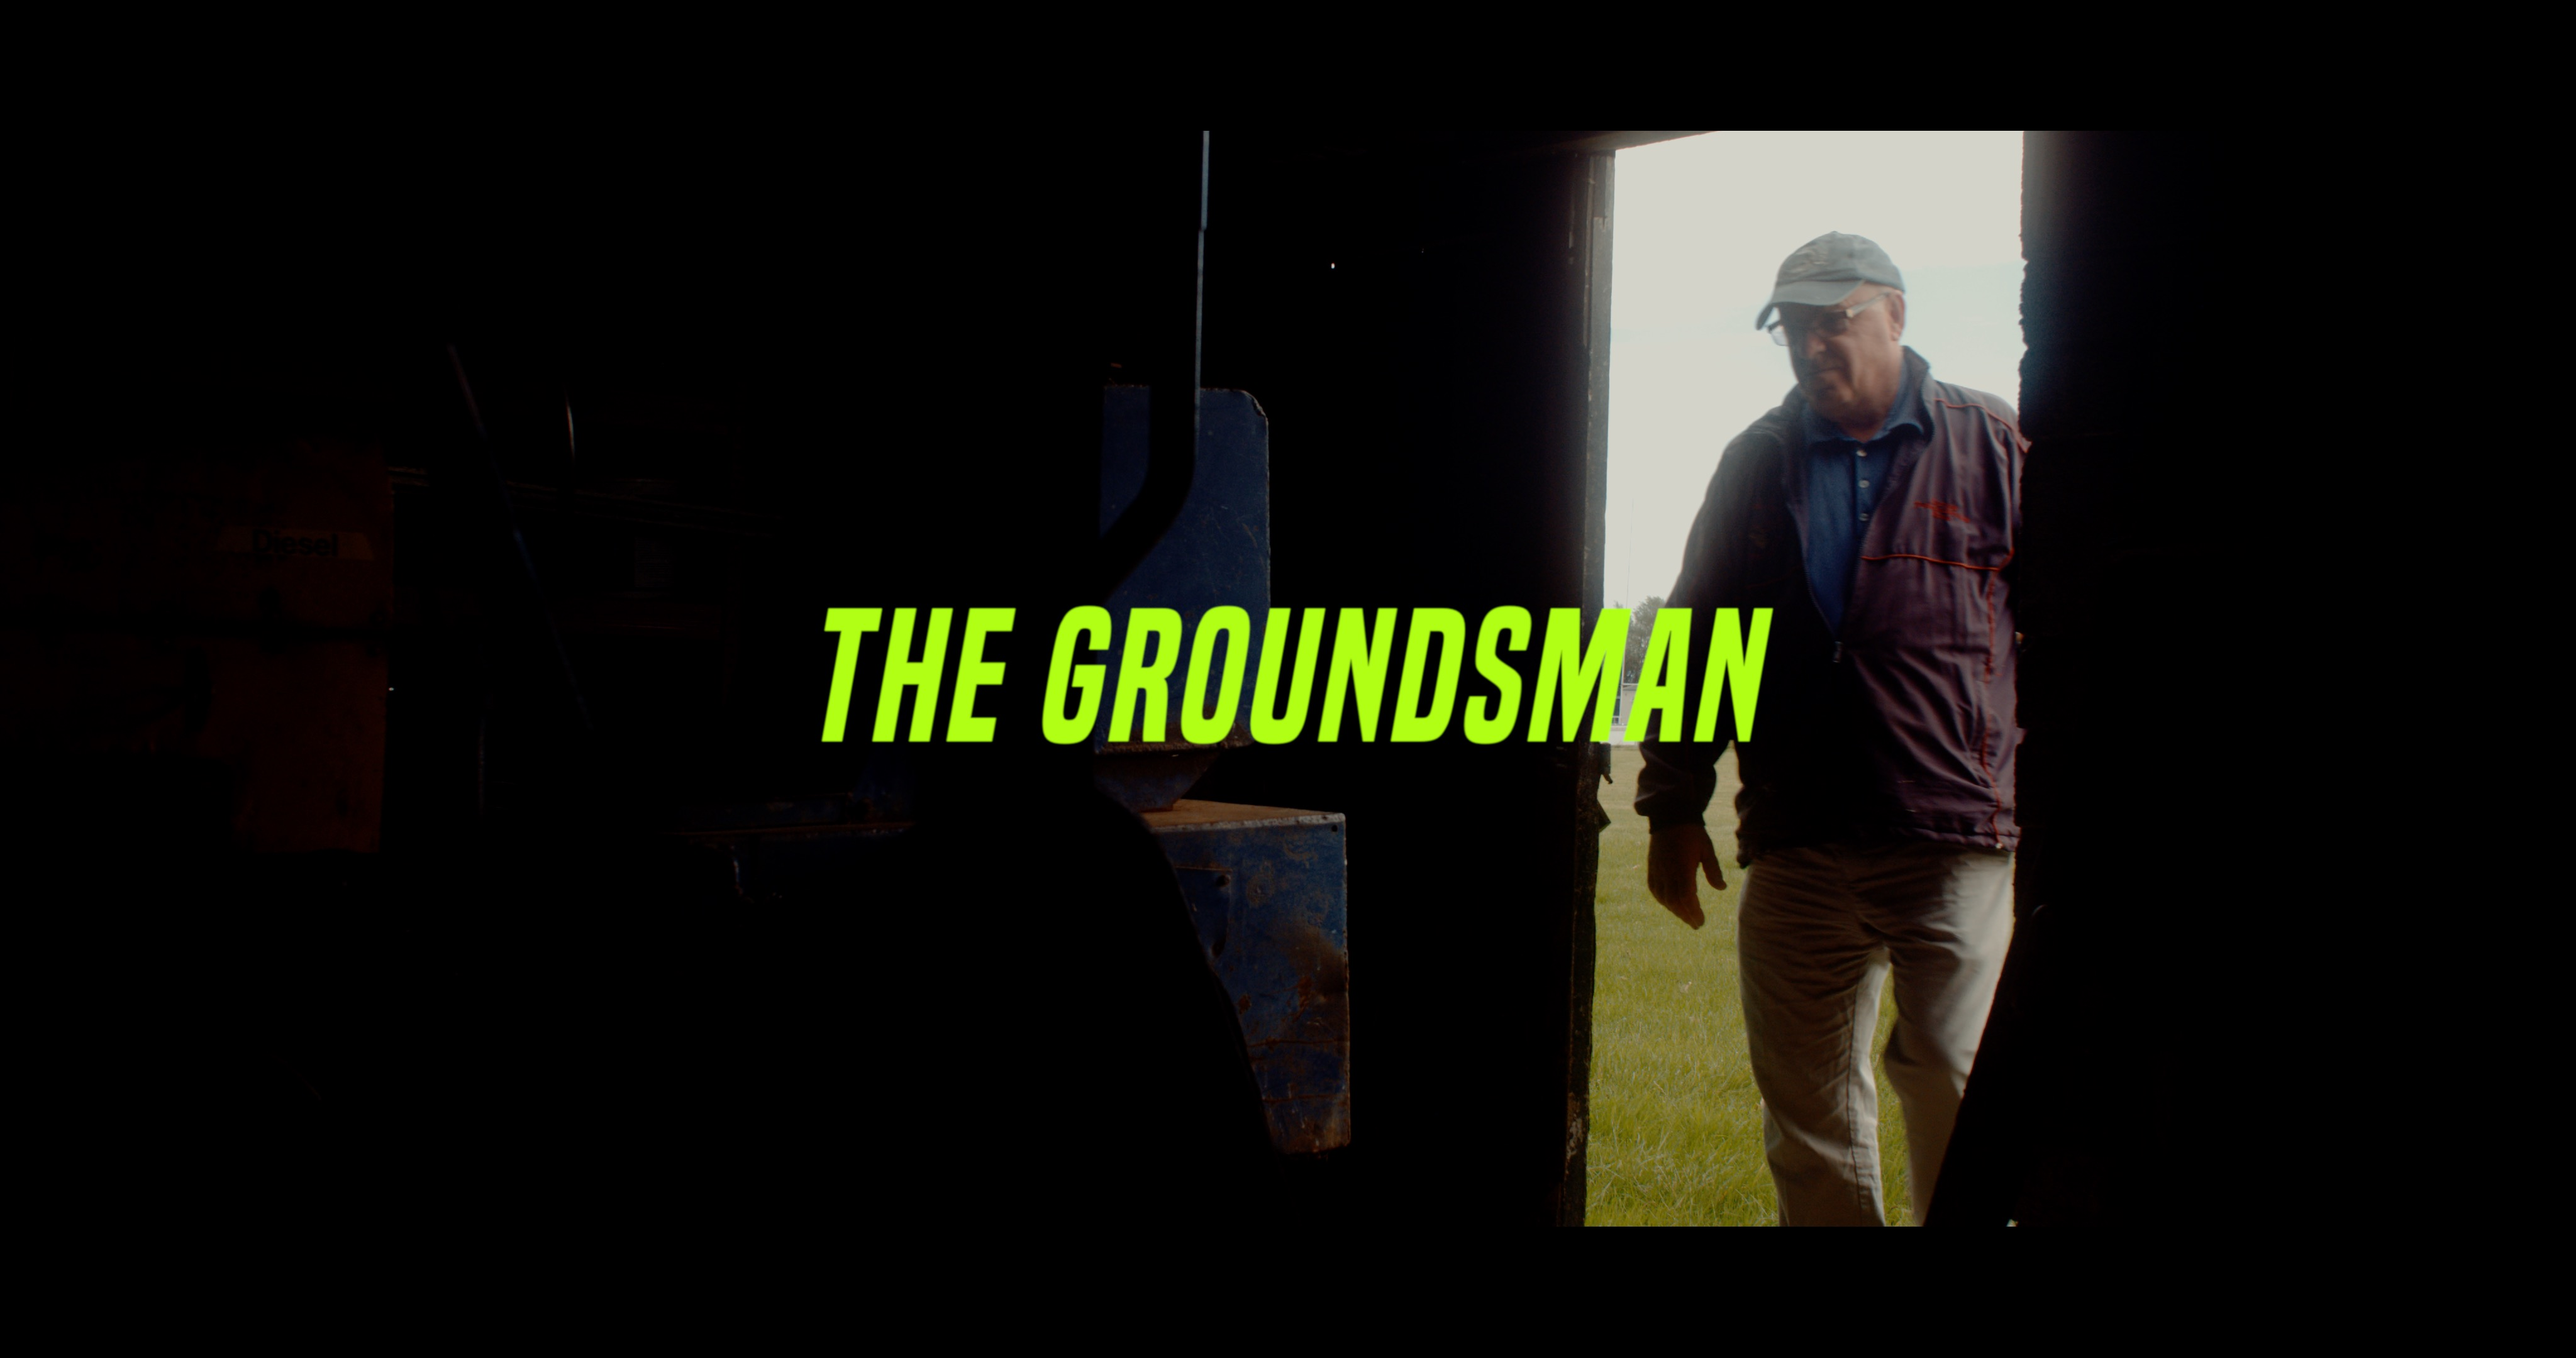 The Groundsman - My RØDE Reel 2020